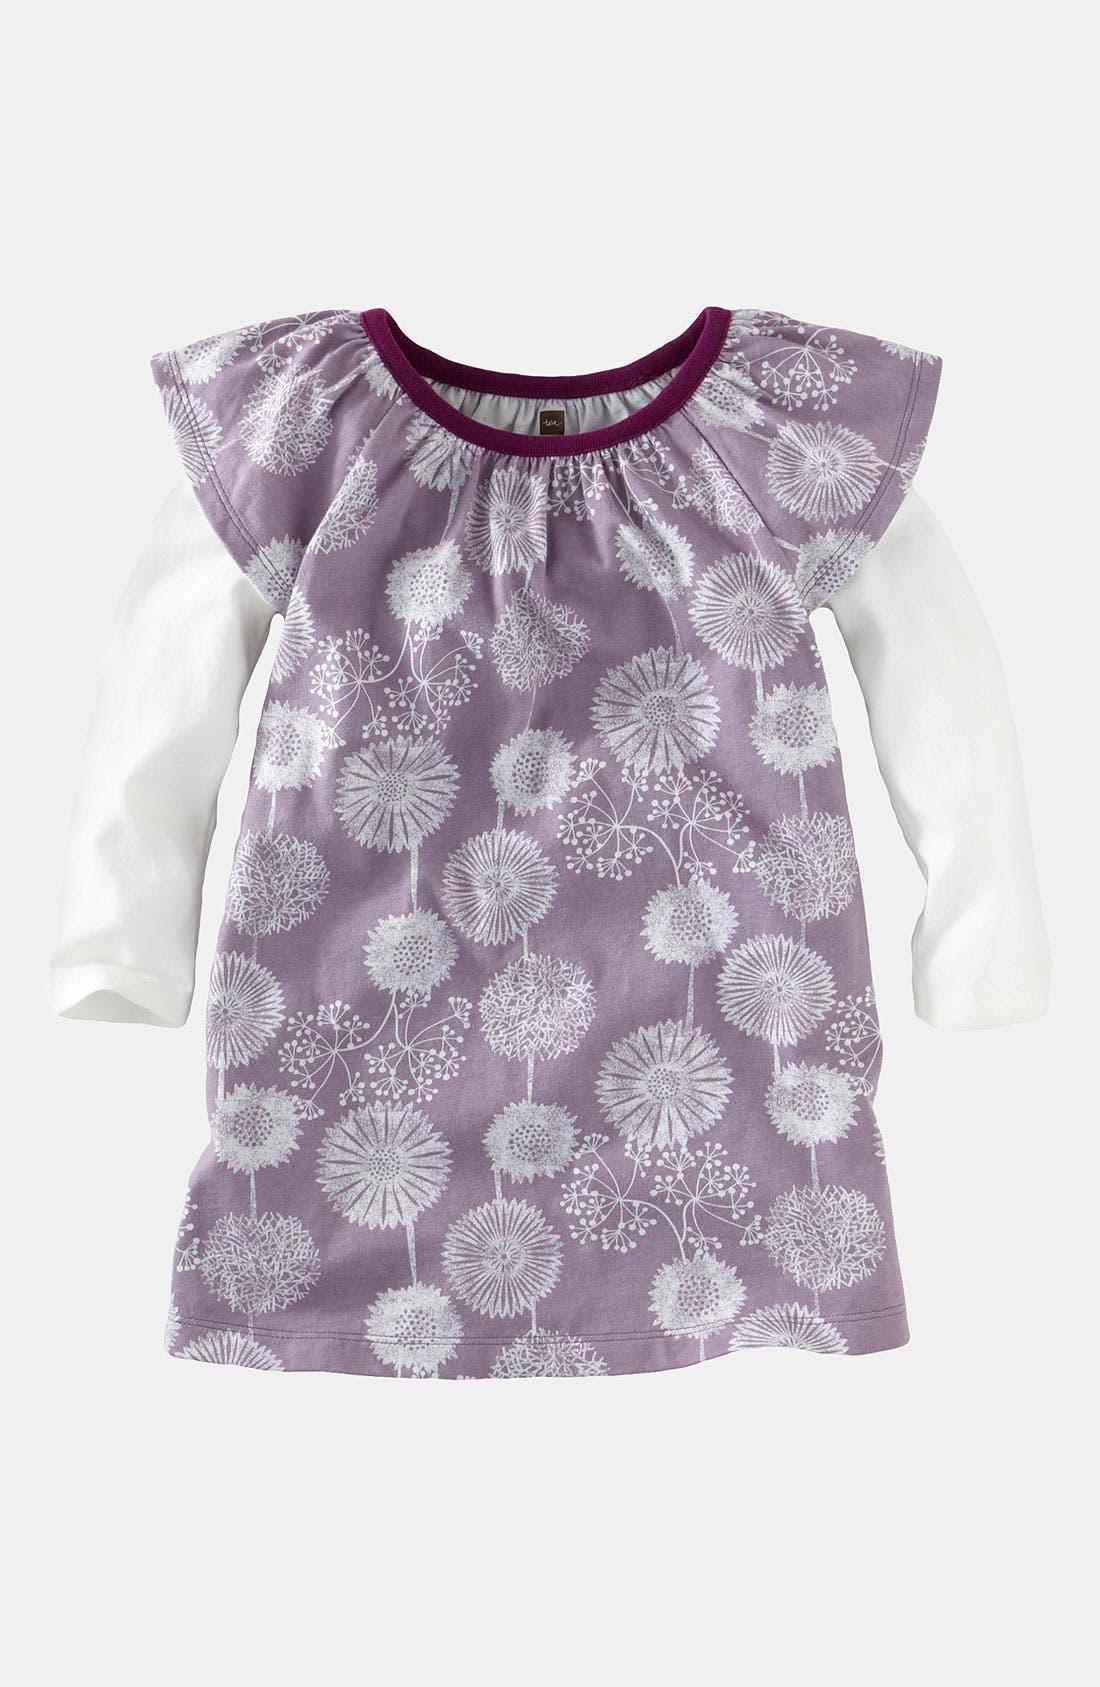 Alternate Image 1 Selected - Tea Collection 'Svenska Wildflower' Layered Sleeve Dress (Toddler)